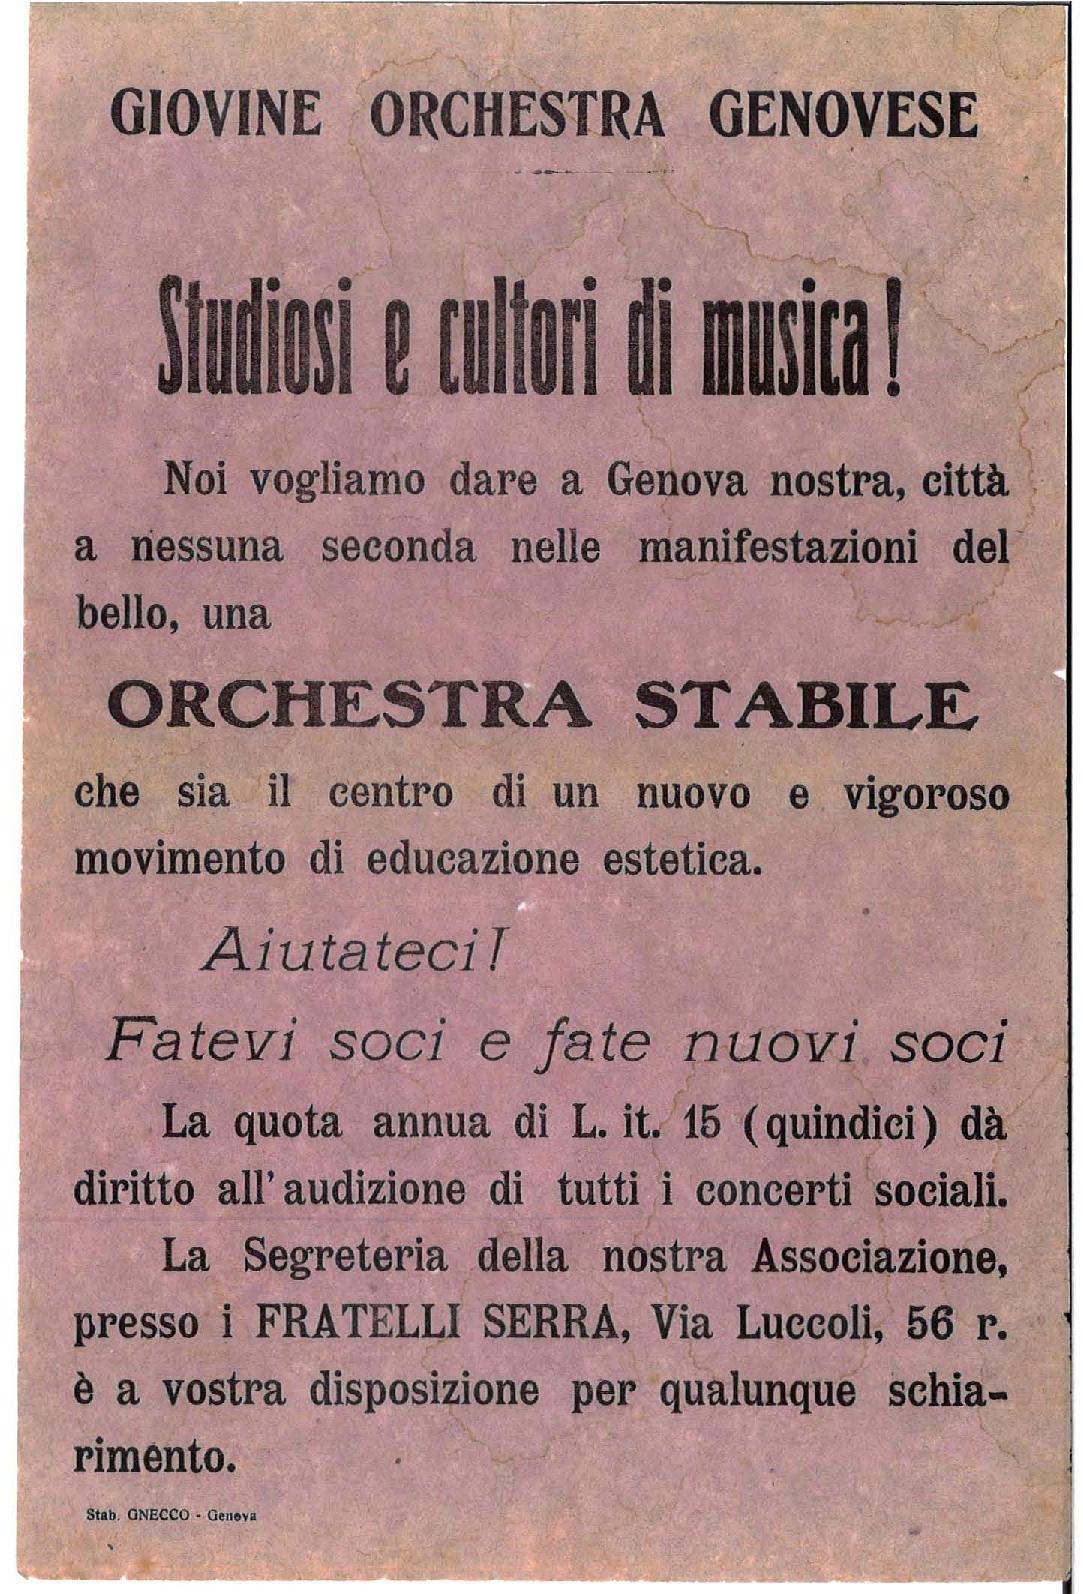 Avviso GOG 1912_Genova